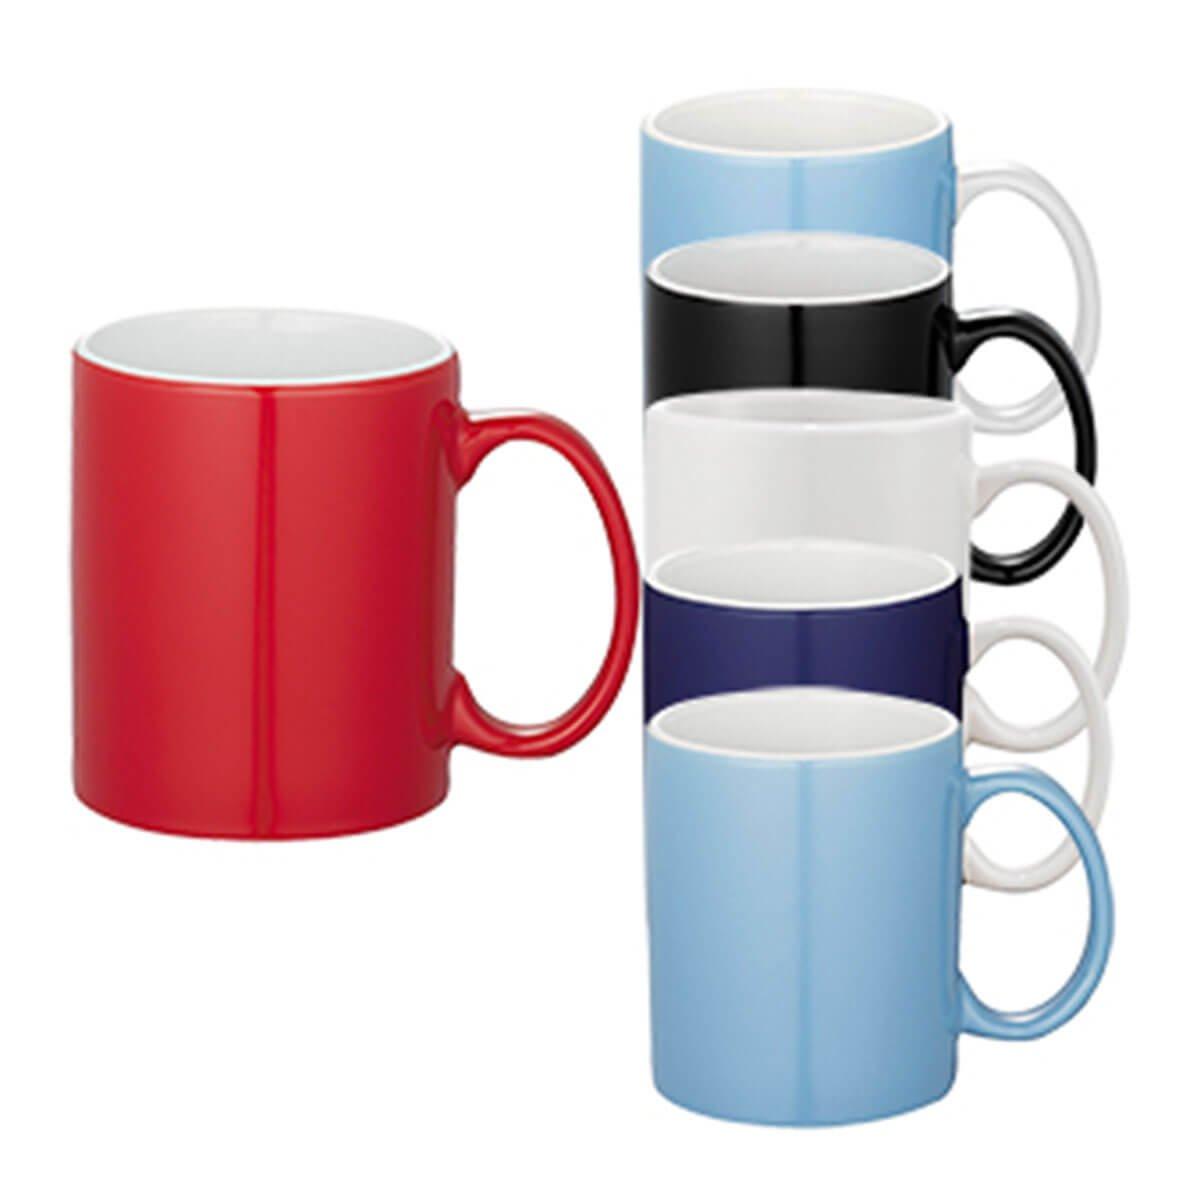 Bounty Ceramic Mug-Red.